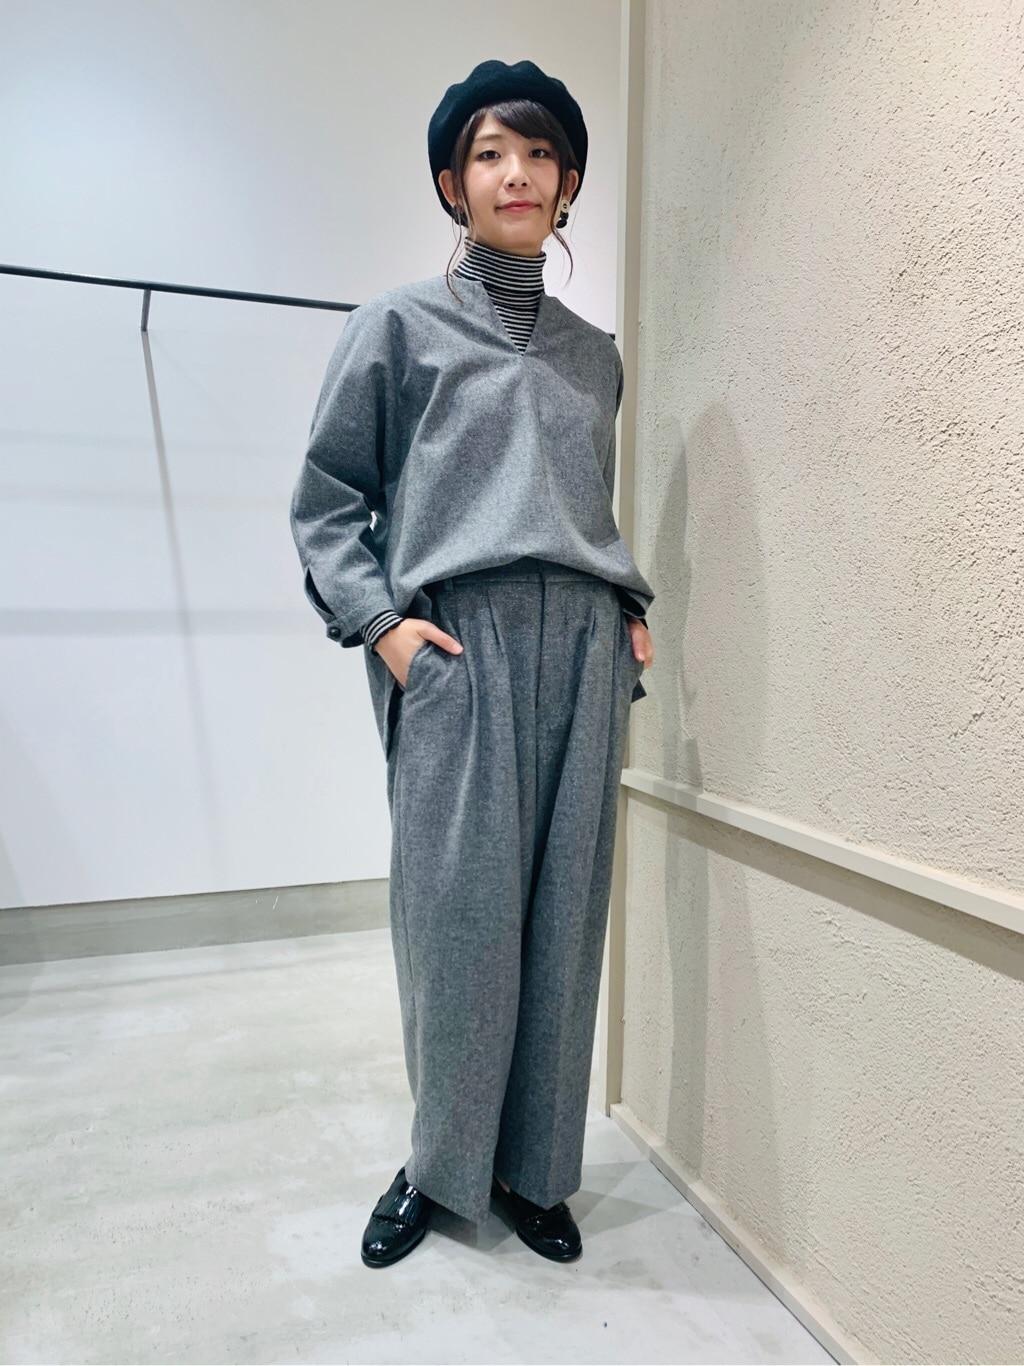 chambre de charme 横浜ジョイナス 身長:162cm 2020.11.04